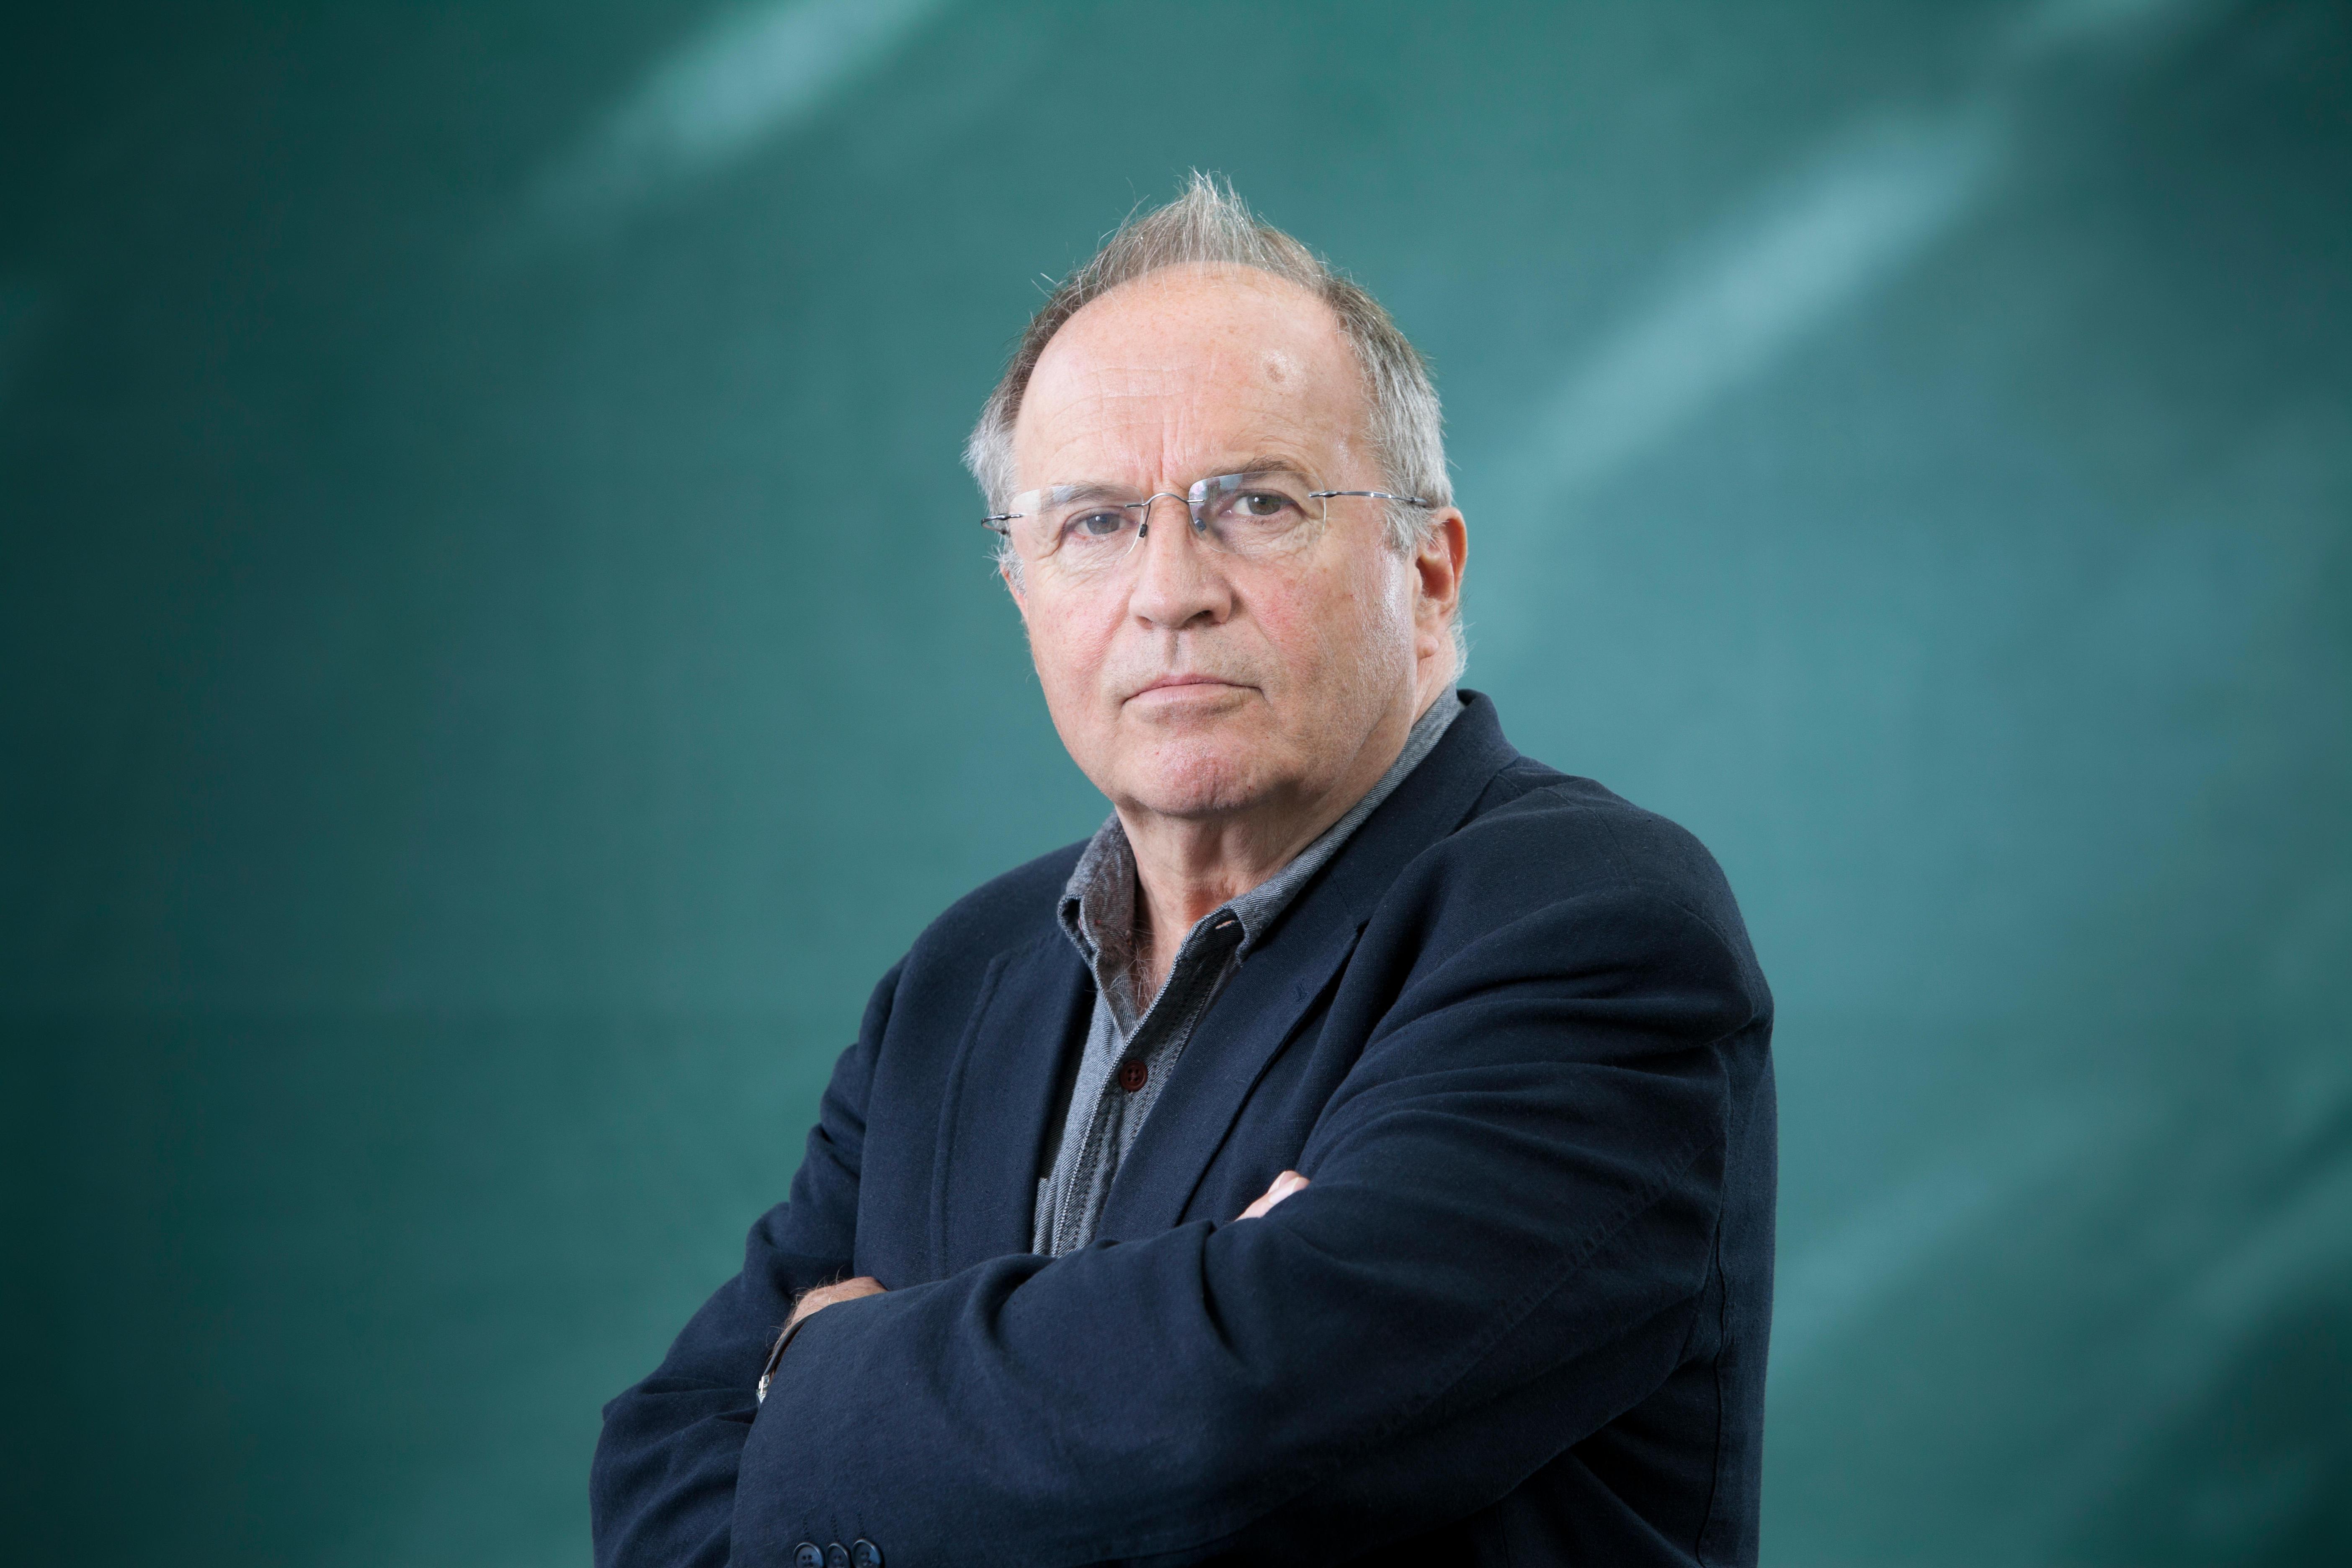 David Reynolds, Professor of international history at Christ's College, Cambridge. (Photo by Alamy)